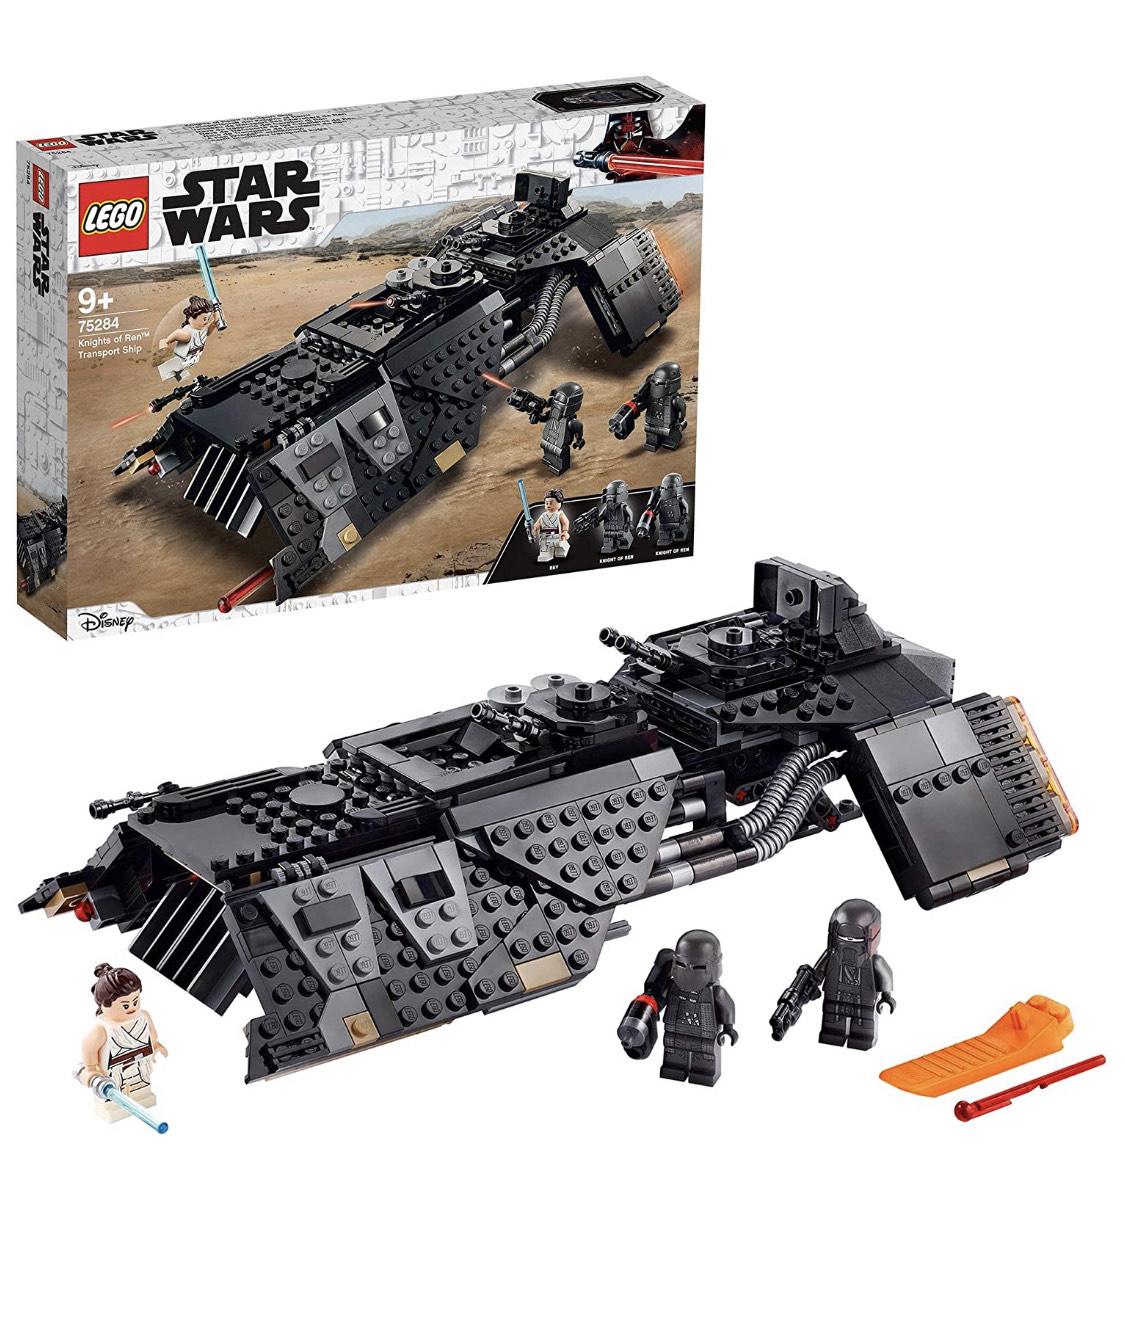 Jouet Lego Star Wars Vaisseau de transport des Chevaliers de Ren 75284